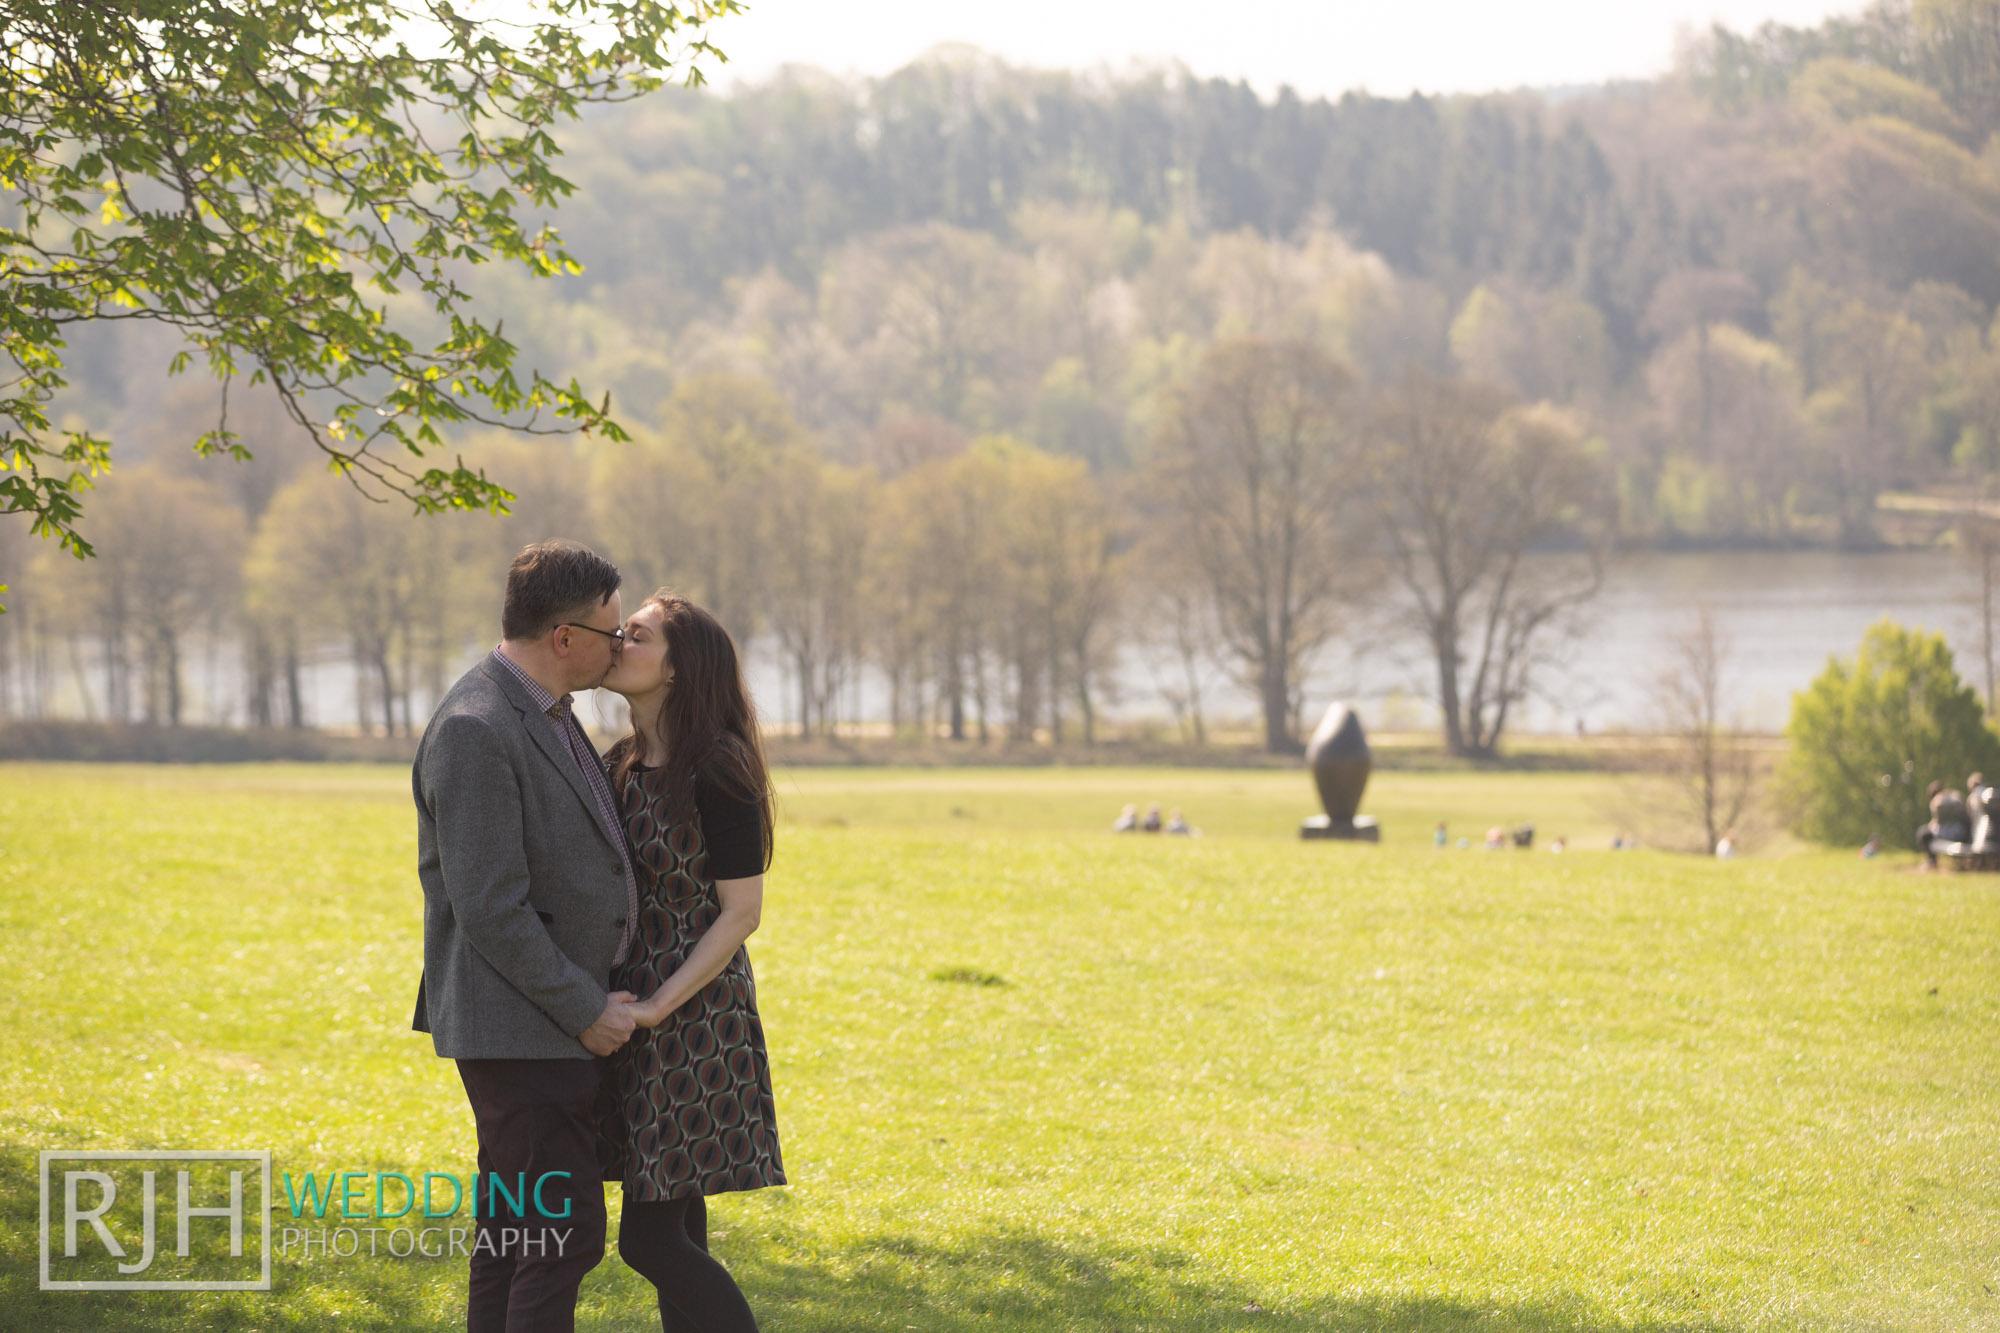 Pre-wedding photography - Richard & Rachel_004_3C2A8117.jpg